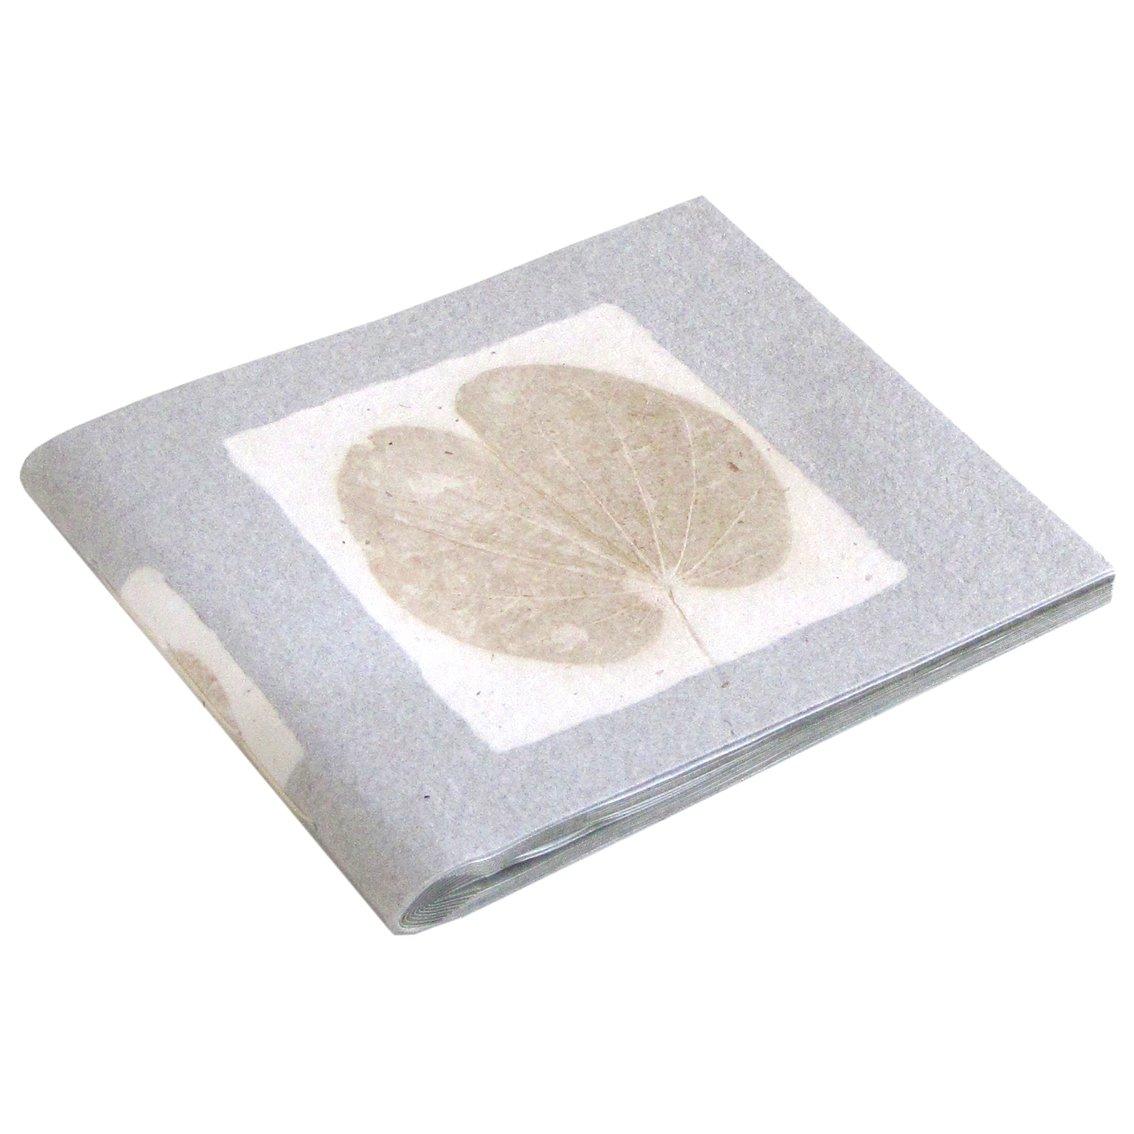 Handmade wedding baby album scrapbook natural leaf 6x8/5x7 photos 16pp paper craft mom present